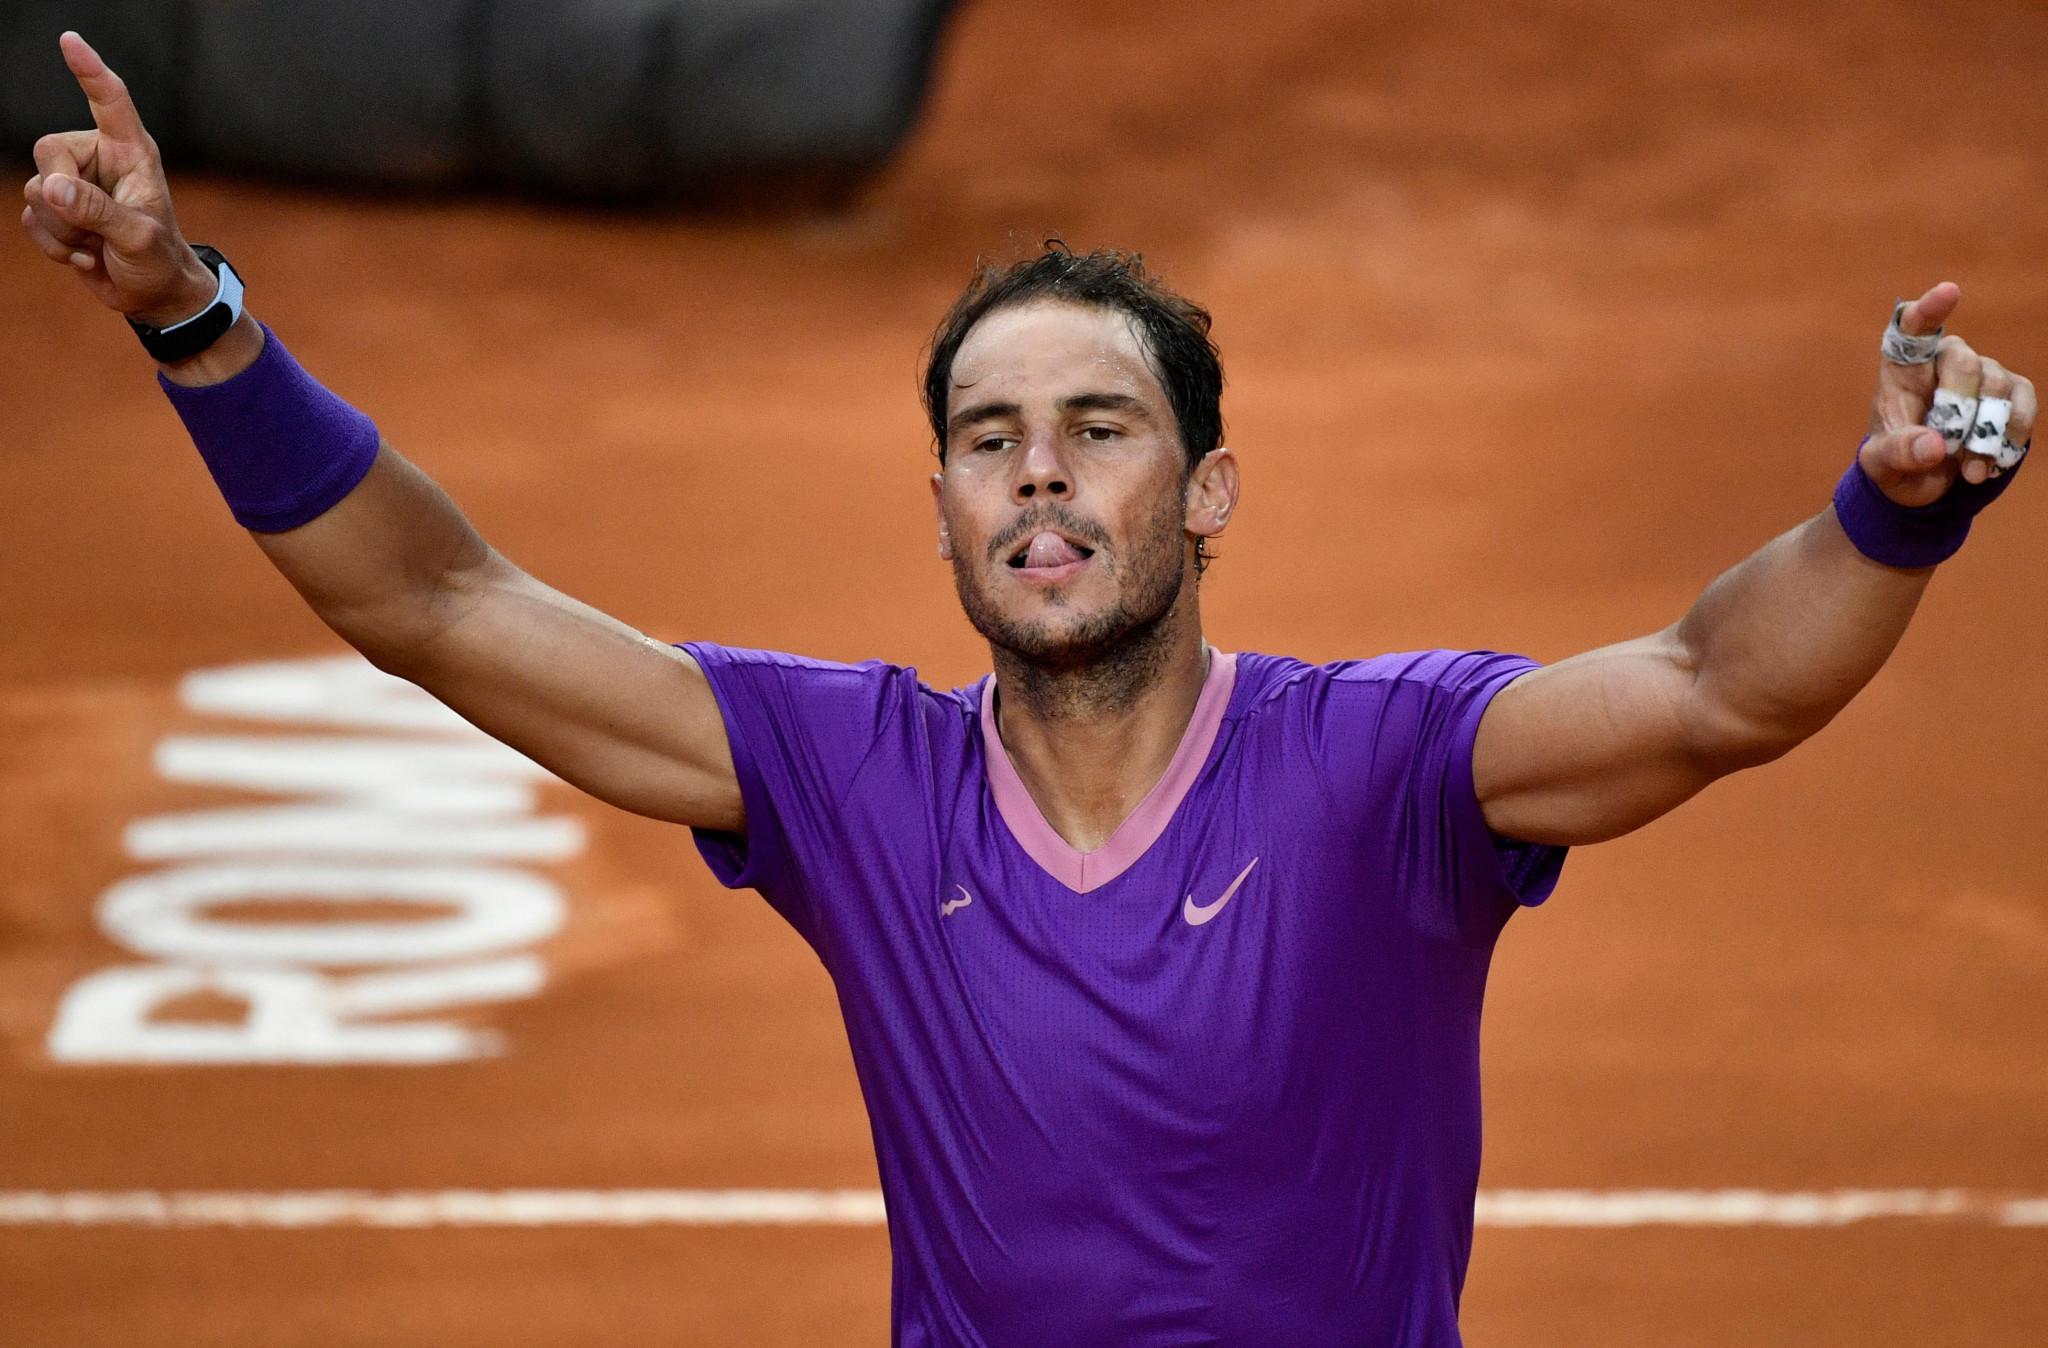 Nadal beats Djokovic for record-extending 10th Italian Open title and Świątek strolls women's final